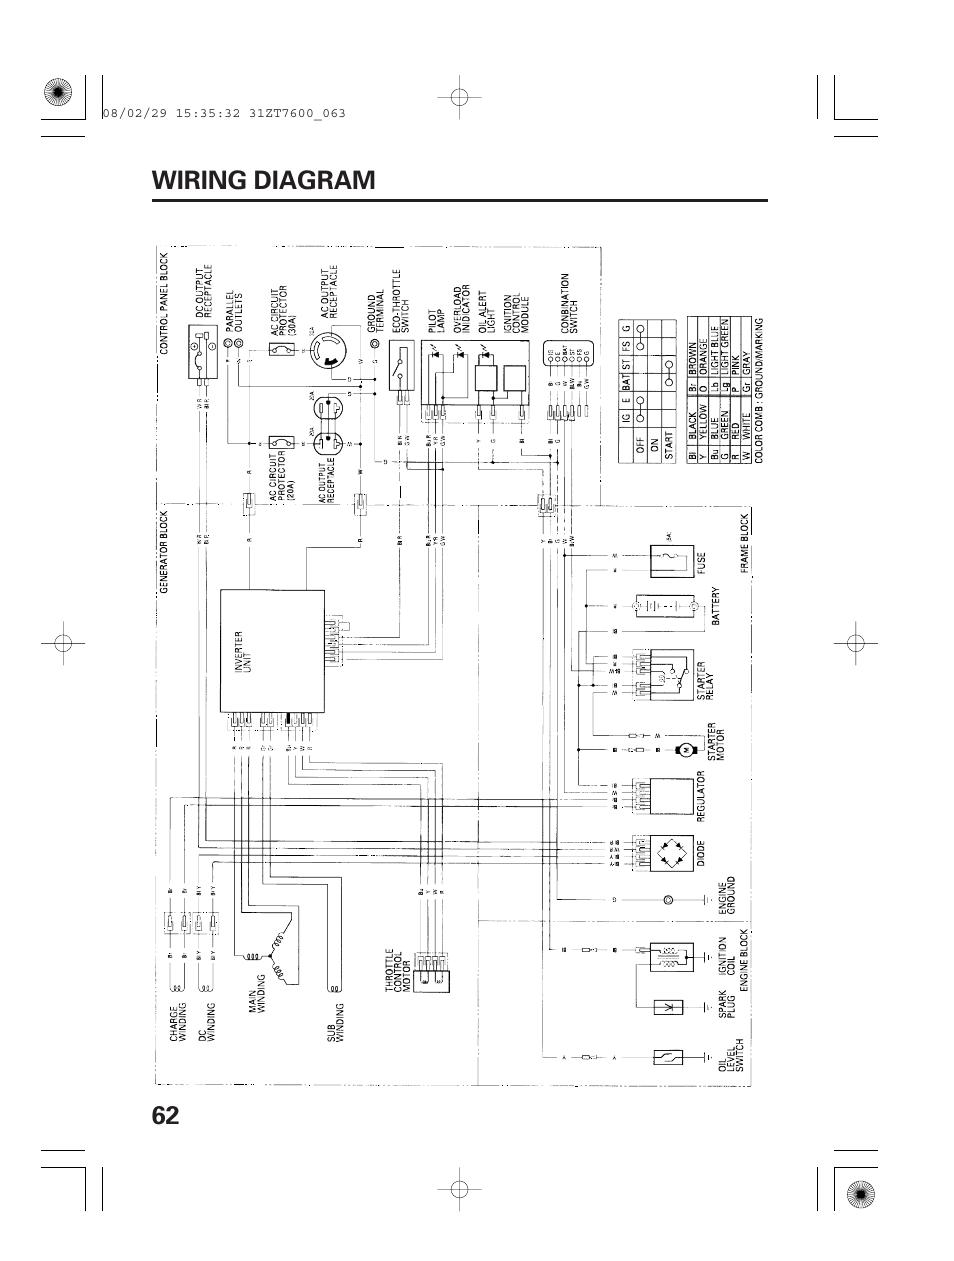 Honda 3000 Wiring Diagram Wiring Diagram Bland Delta Bland Delta Cinemamanzonicasarano It